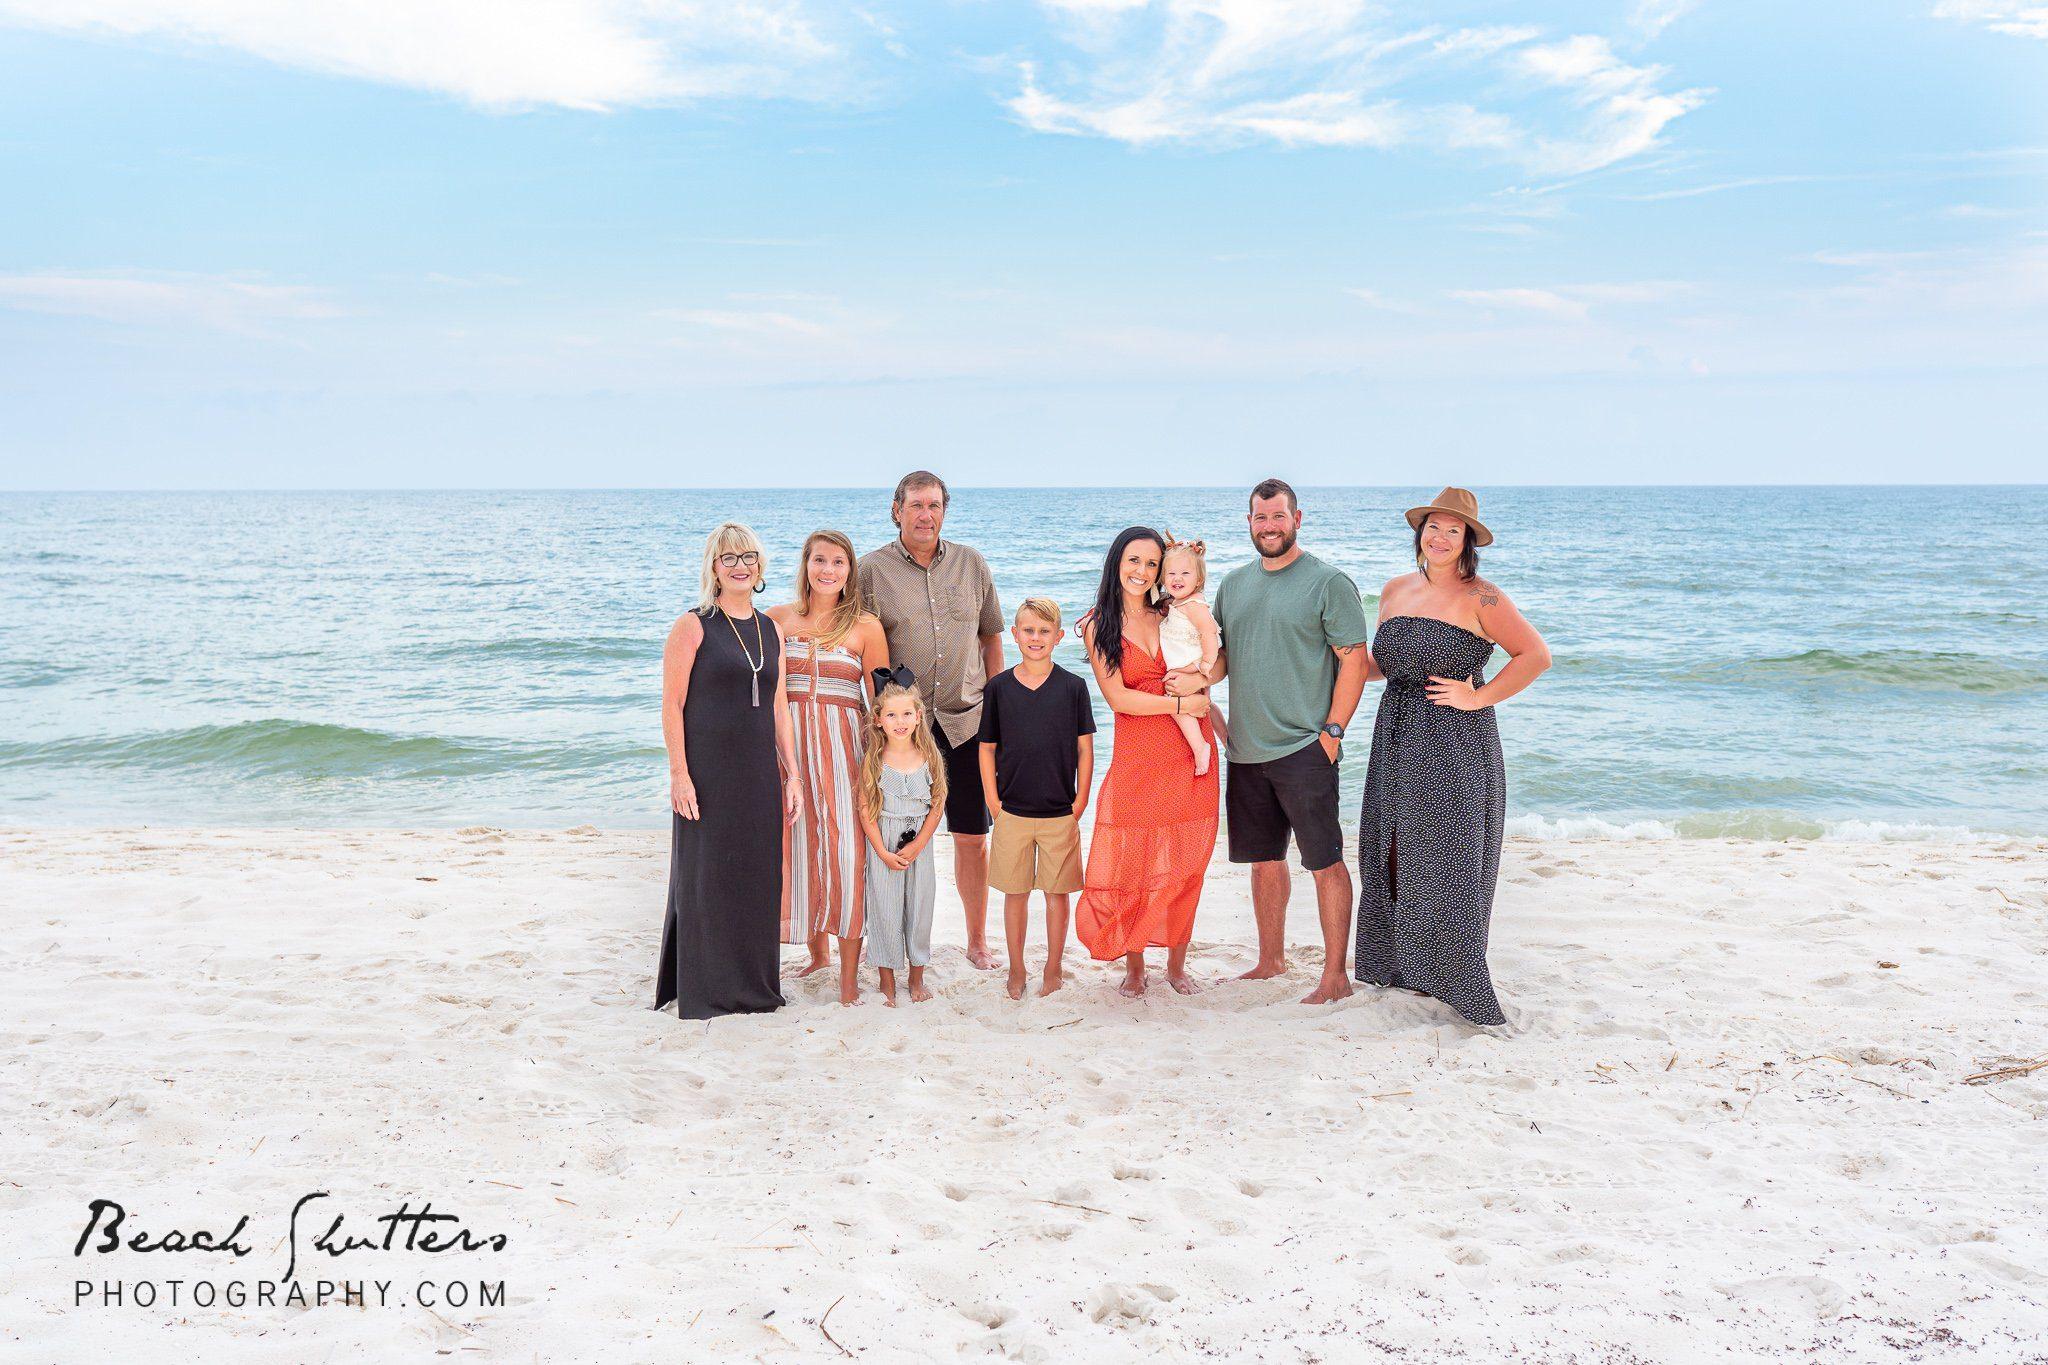 Orange beach Alabama vacations